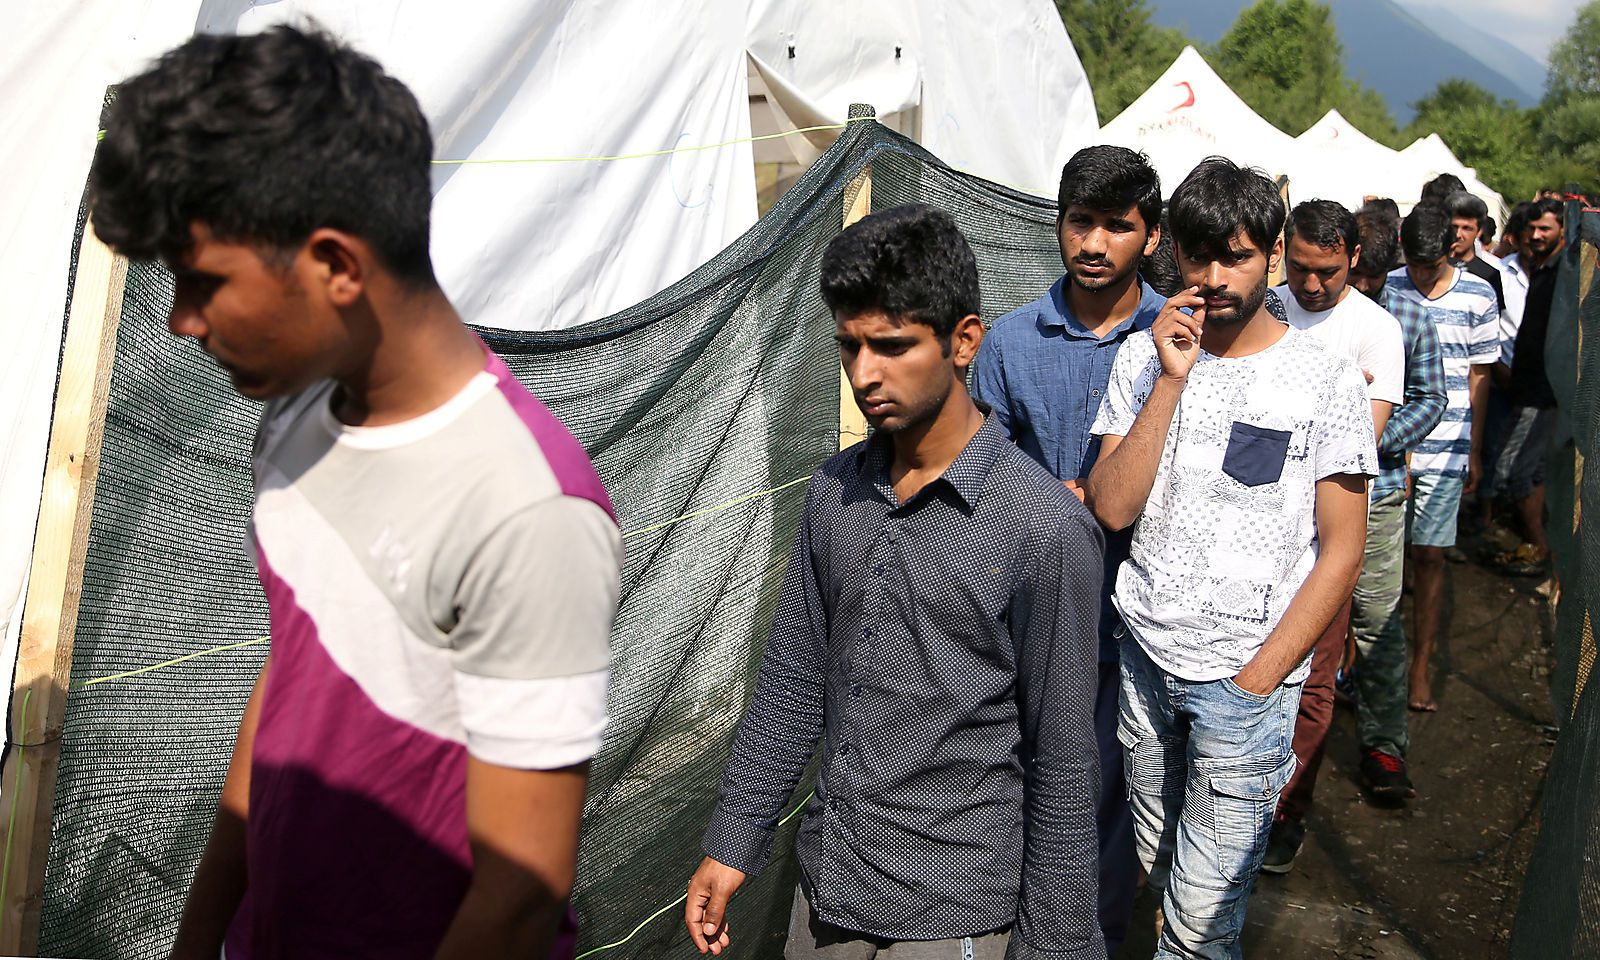 Junge Männer im Migrantenlager Vucjak (Bosnien).